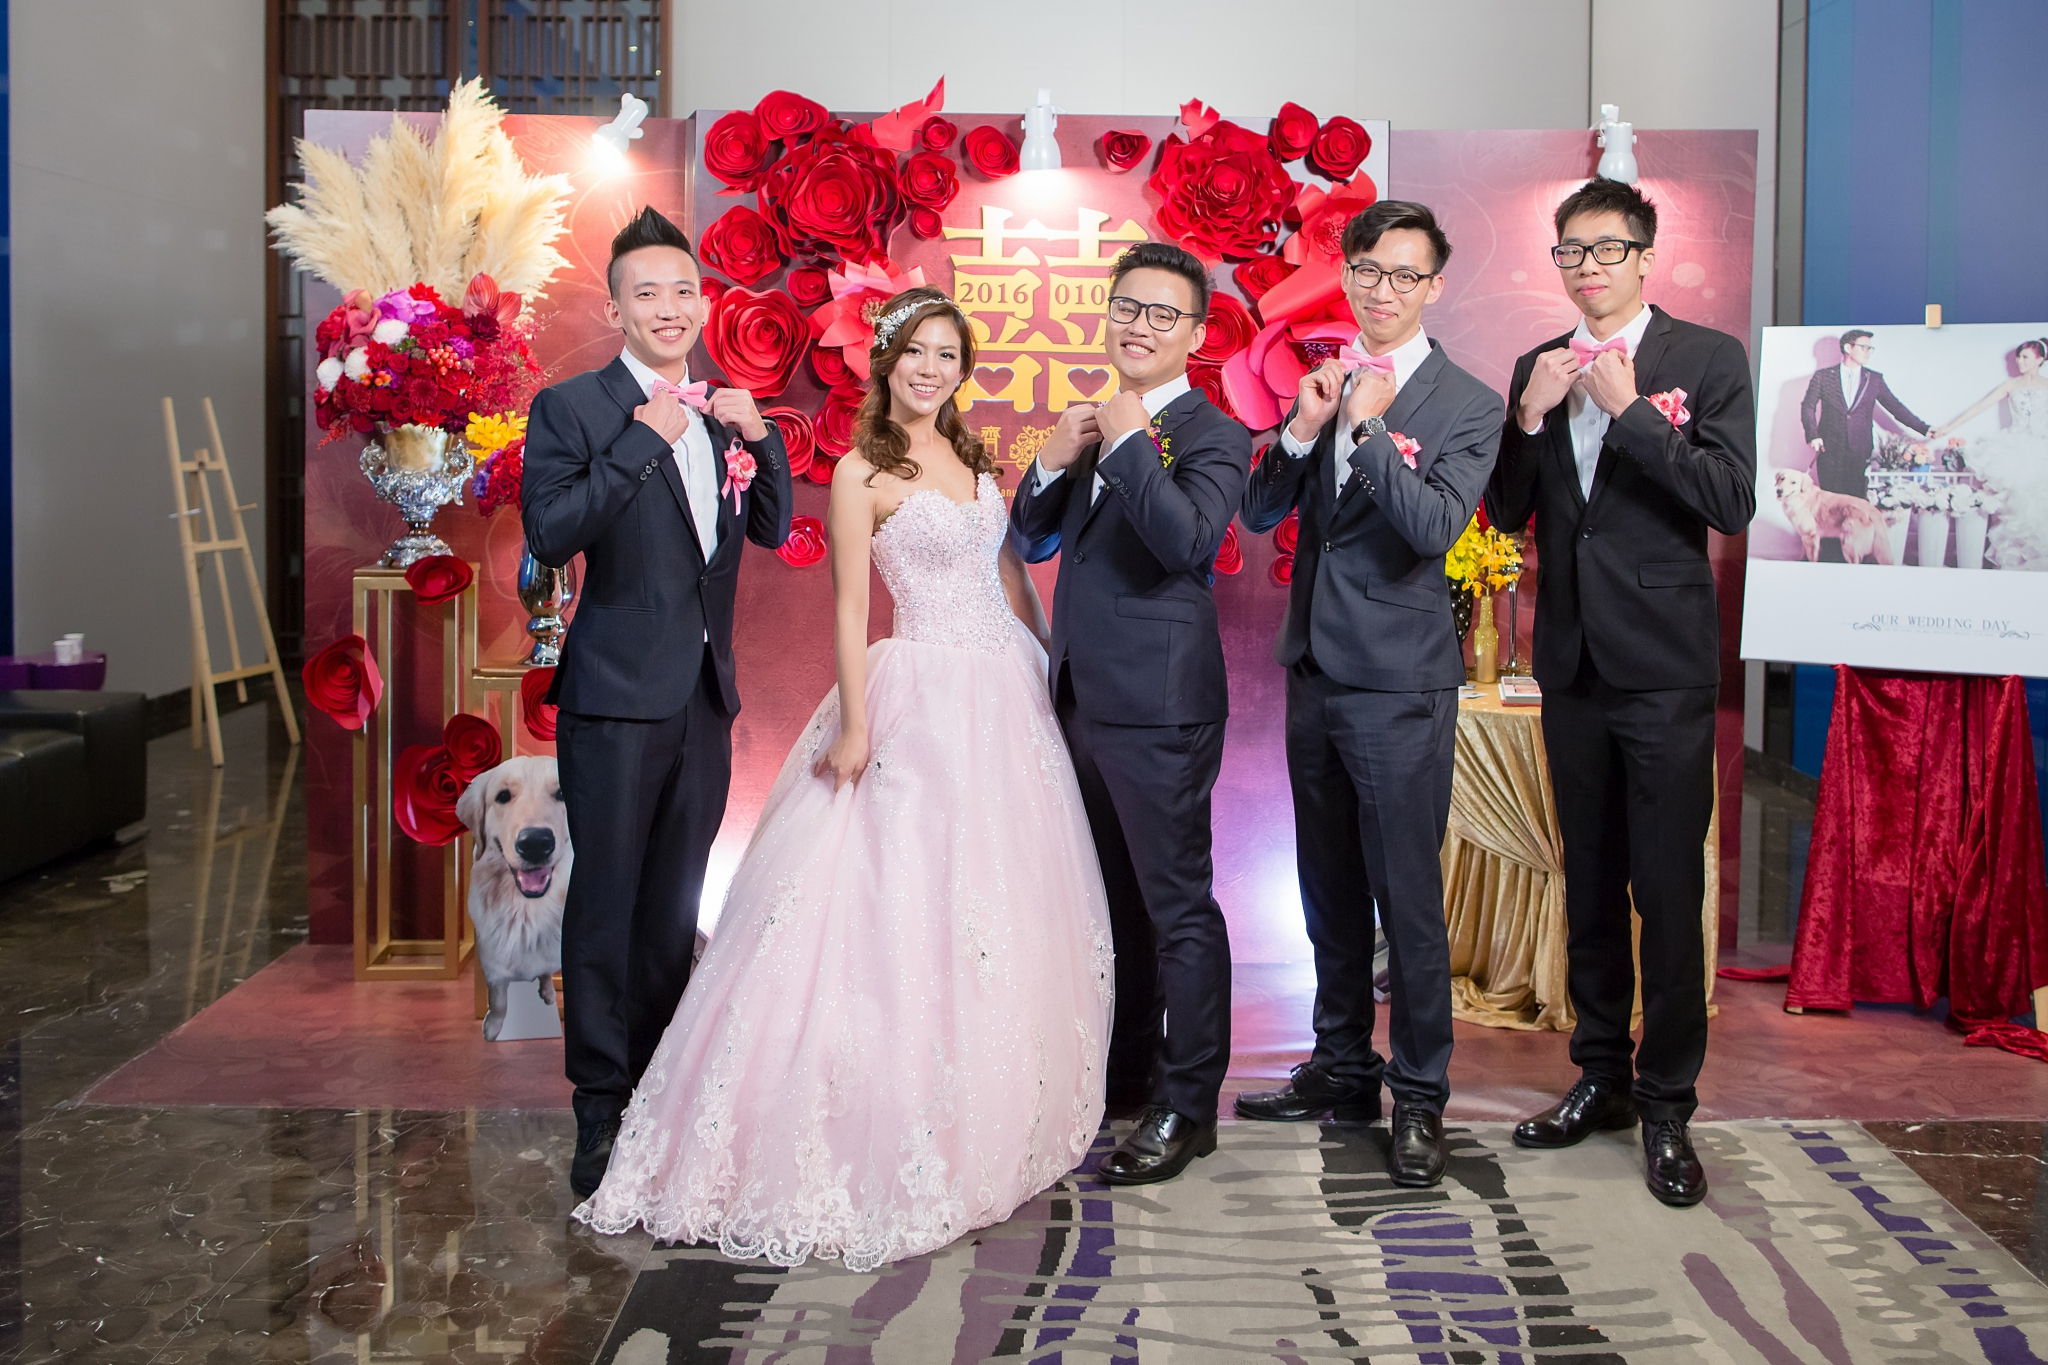 161-wedding